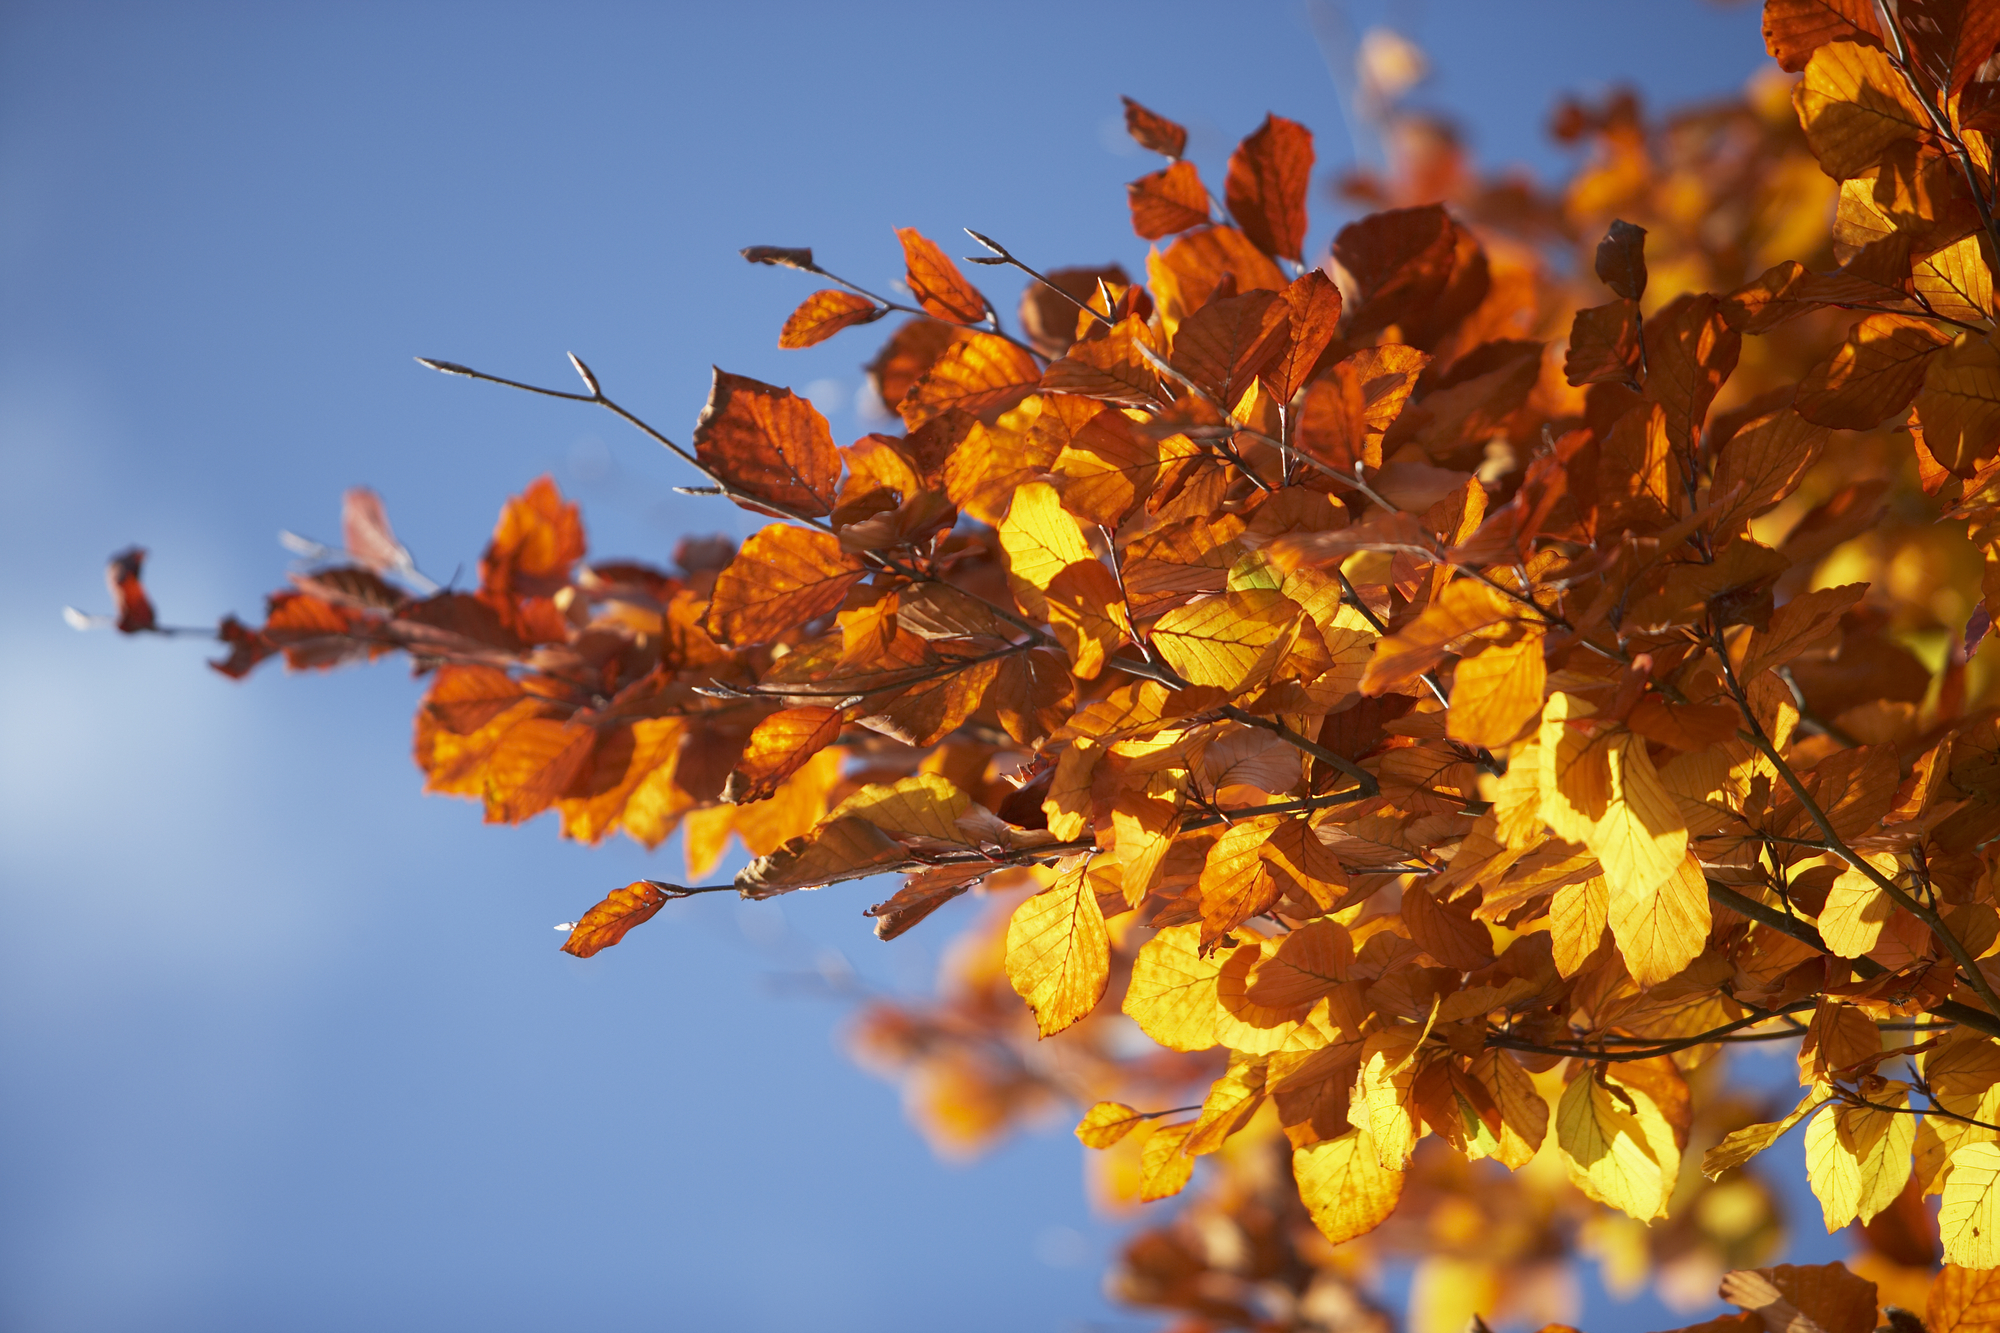 Orange Leaves On A Tree In Autumn